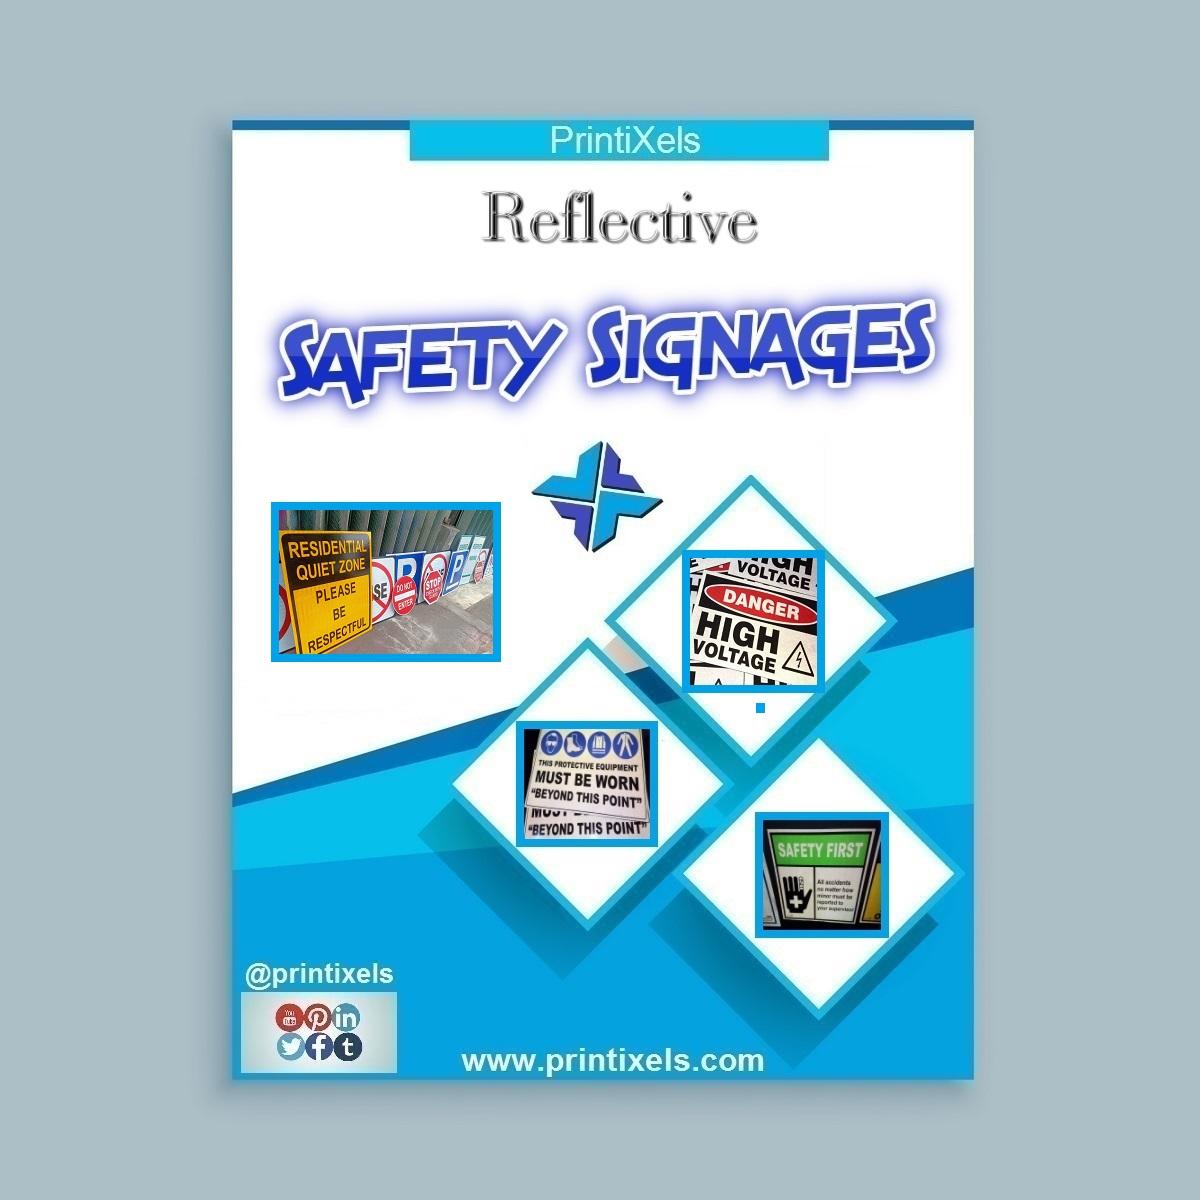 Reflective Safety Signages